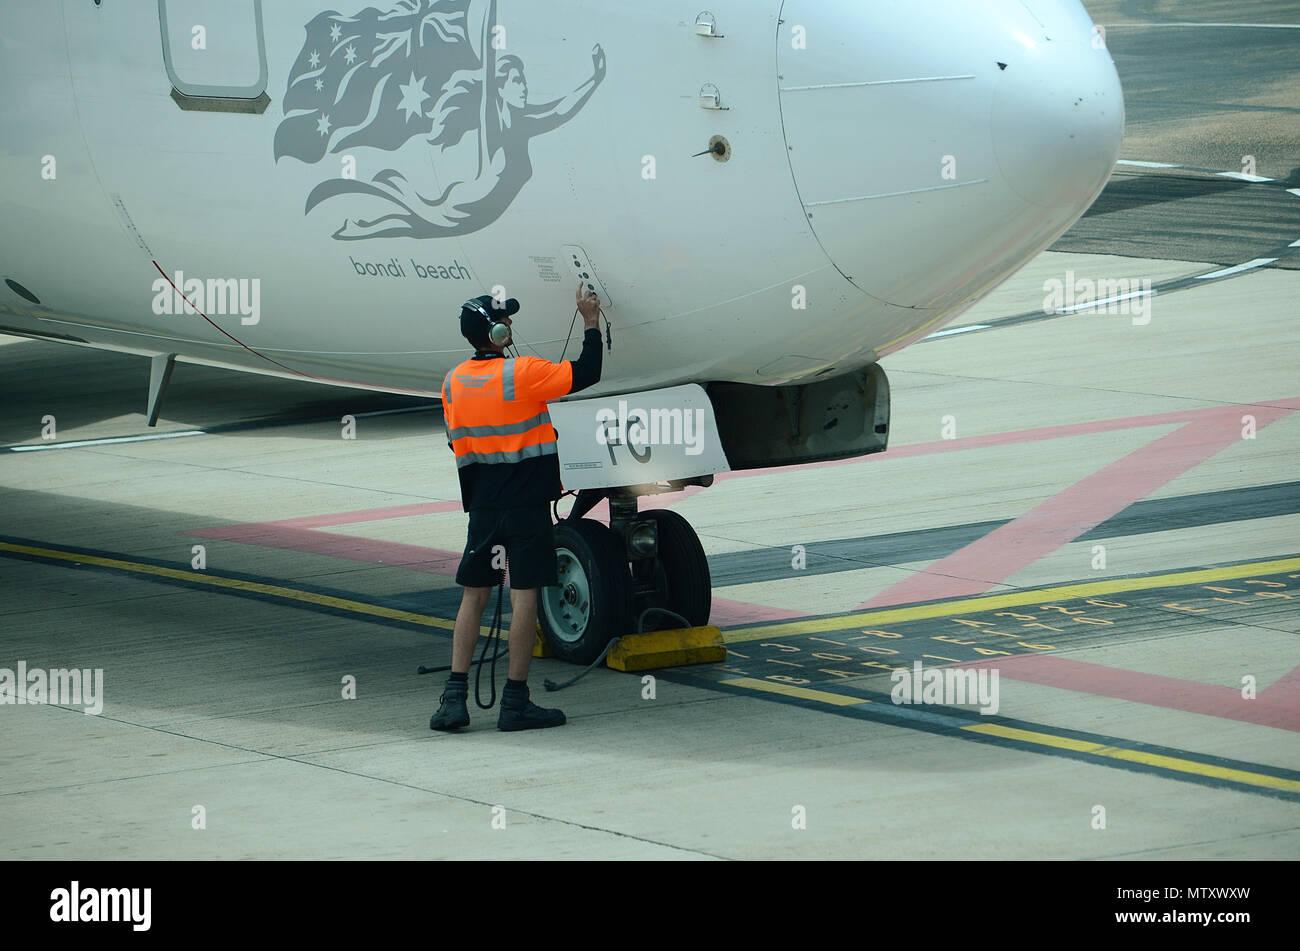 Avión de pasajeros, controles de vuelo previamente Foto de stock